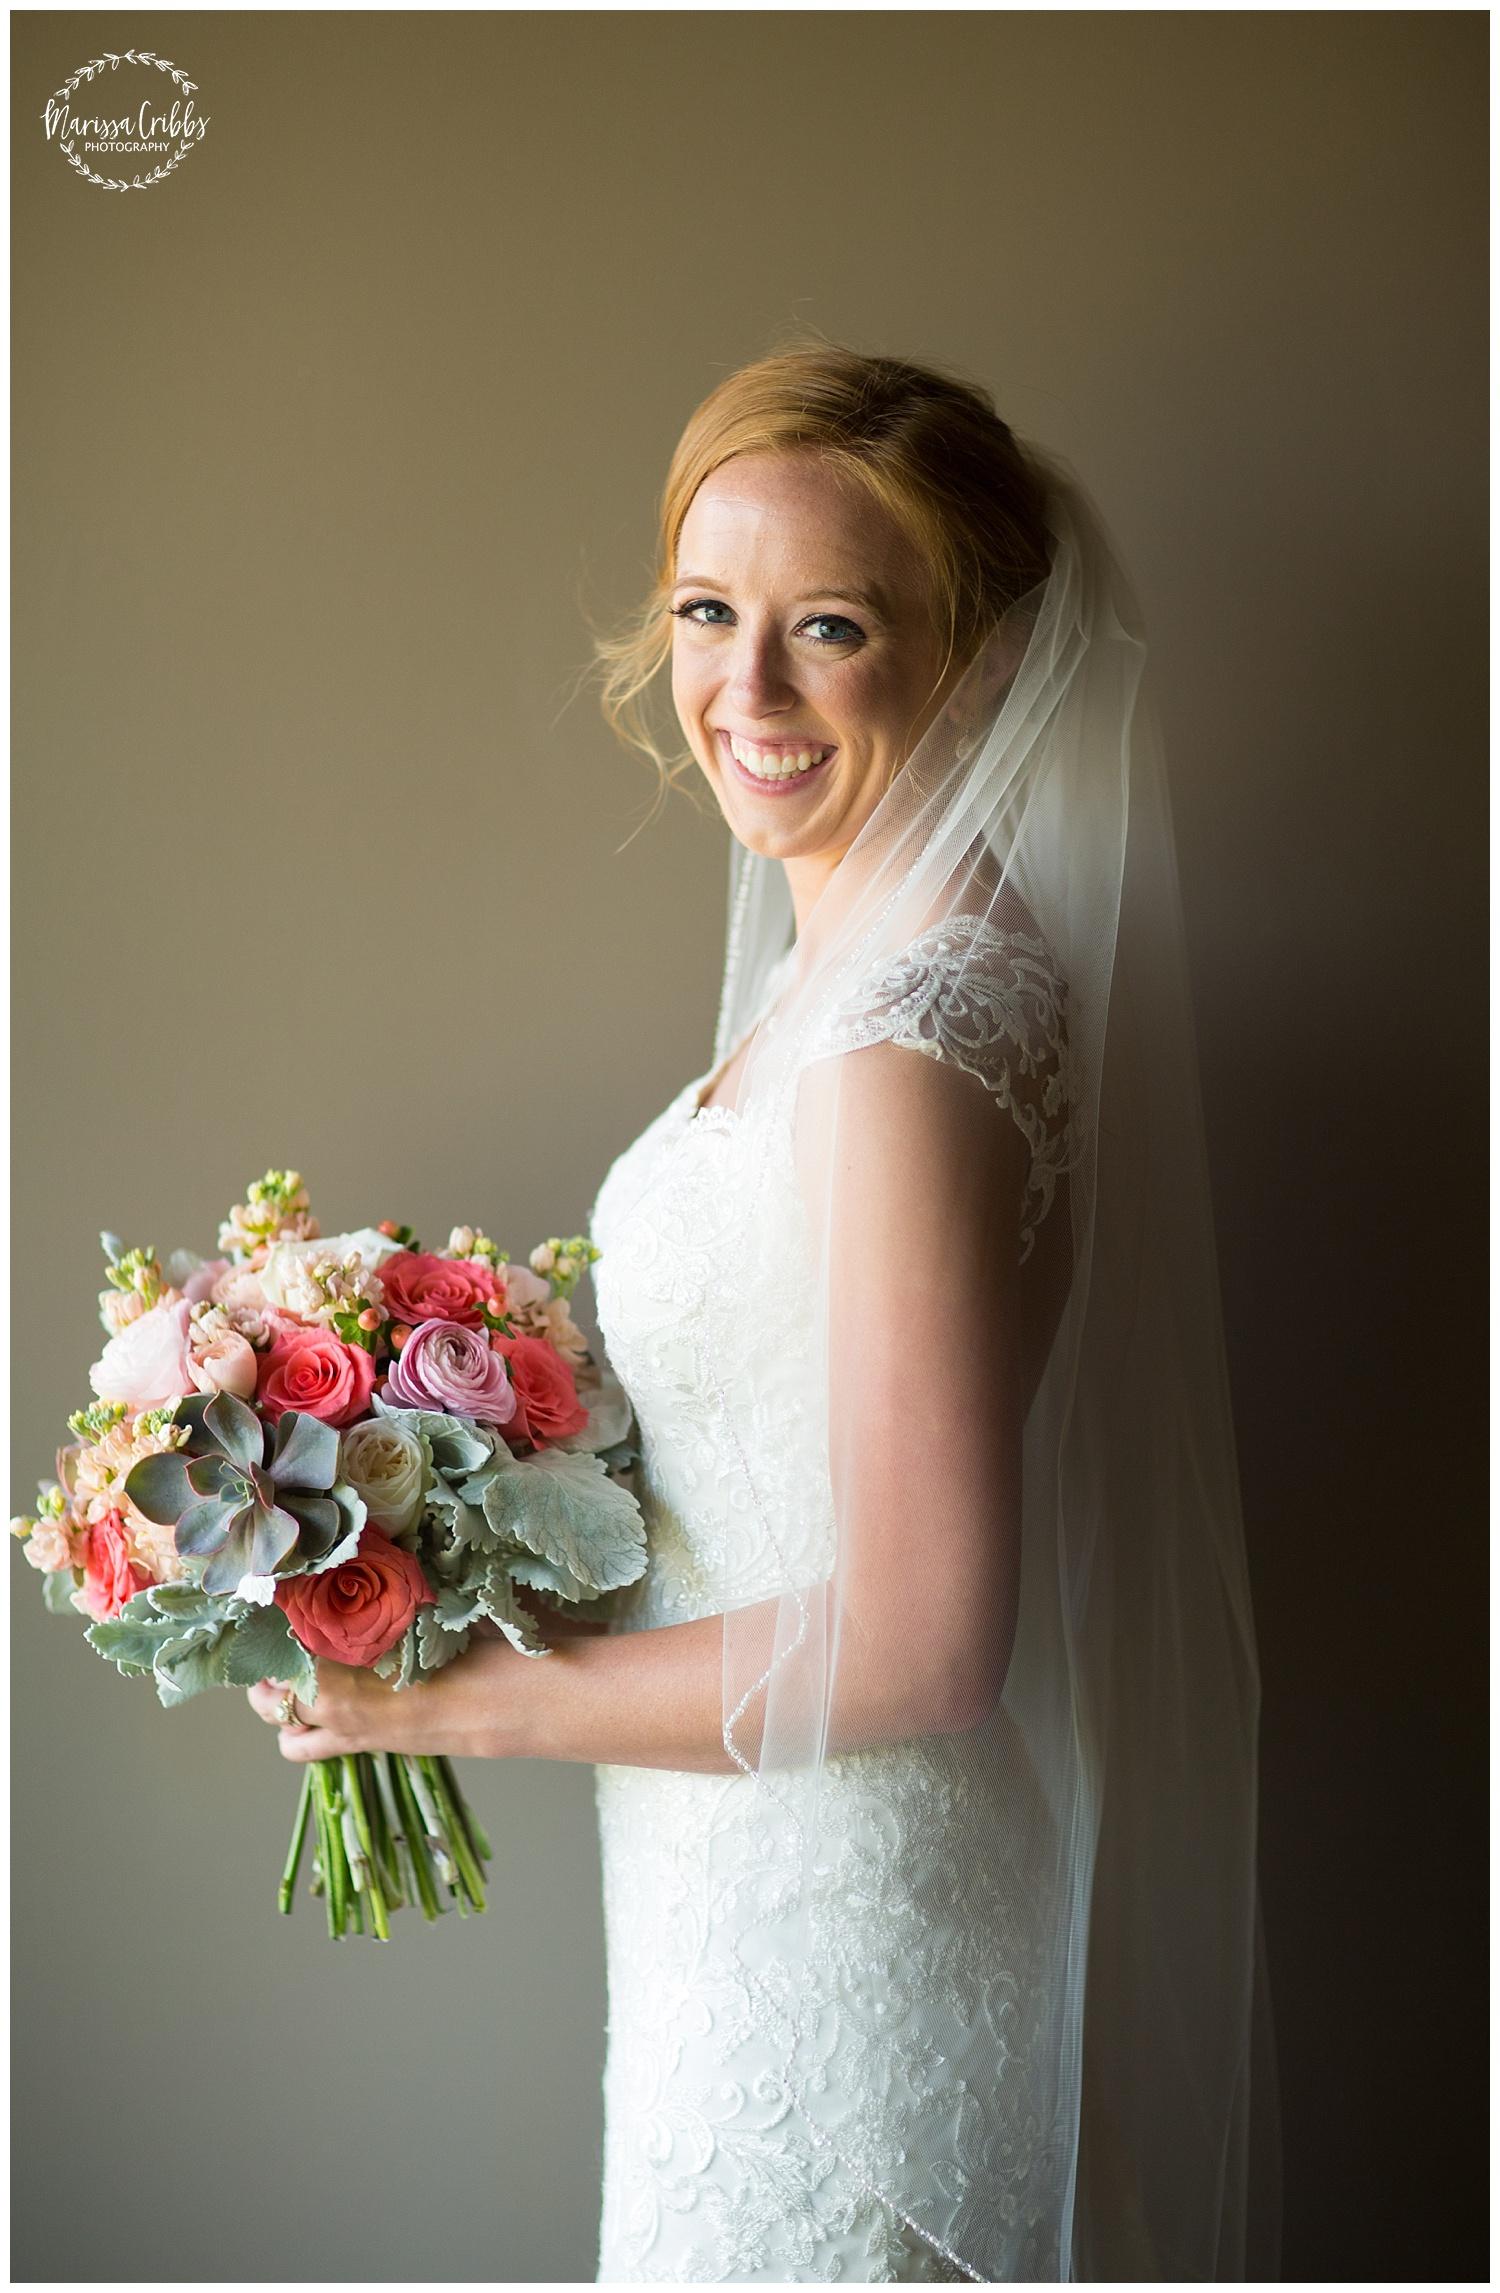 Twin Double Wedding | Union Horse Distilling Co. | Marissa Cribbs Photography | KC Weddings_0091.jpg